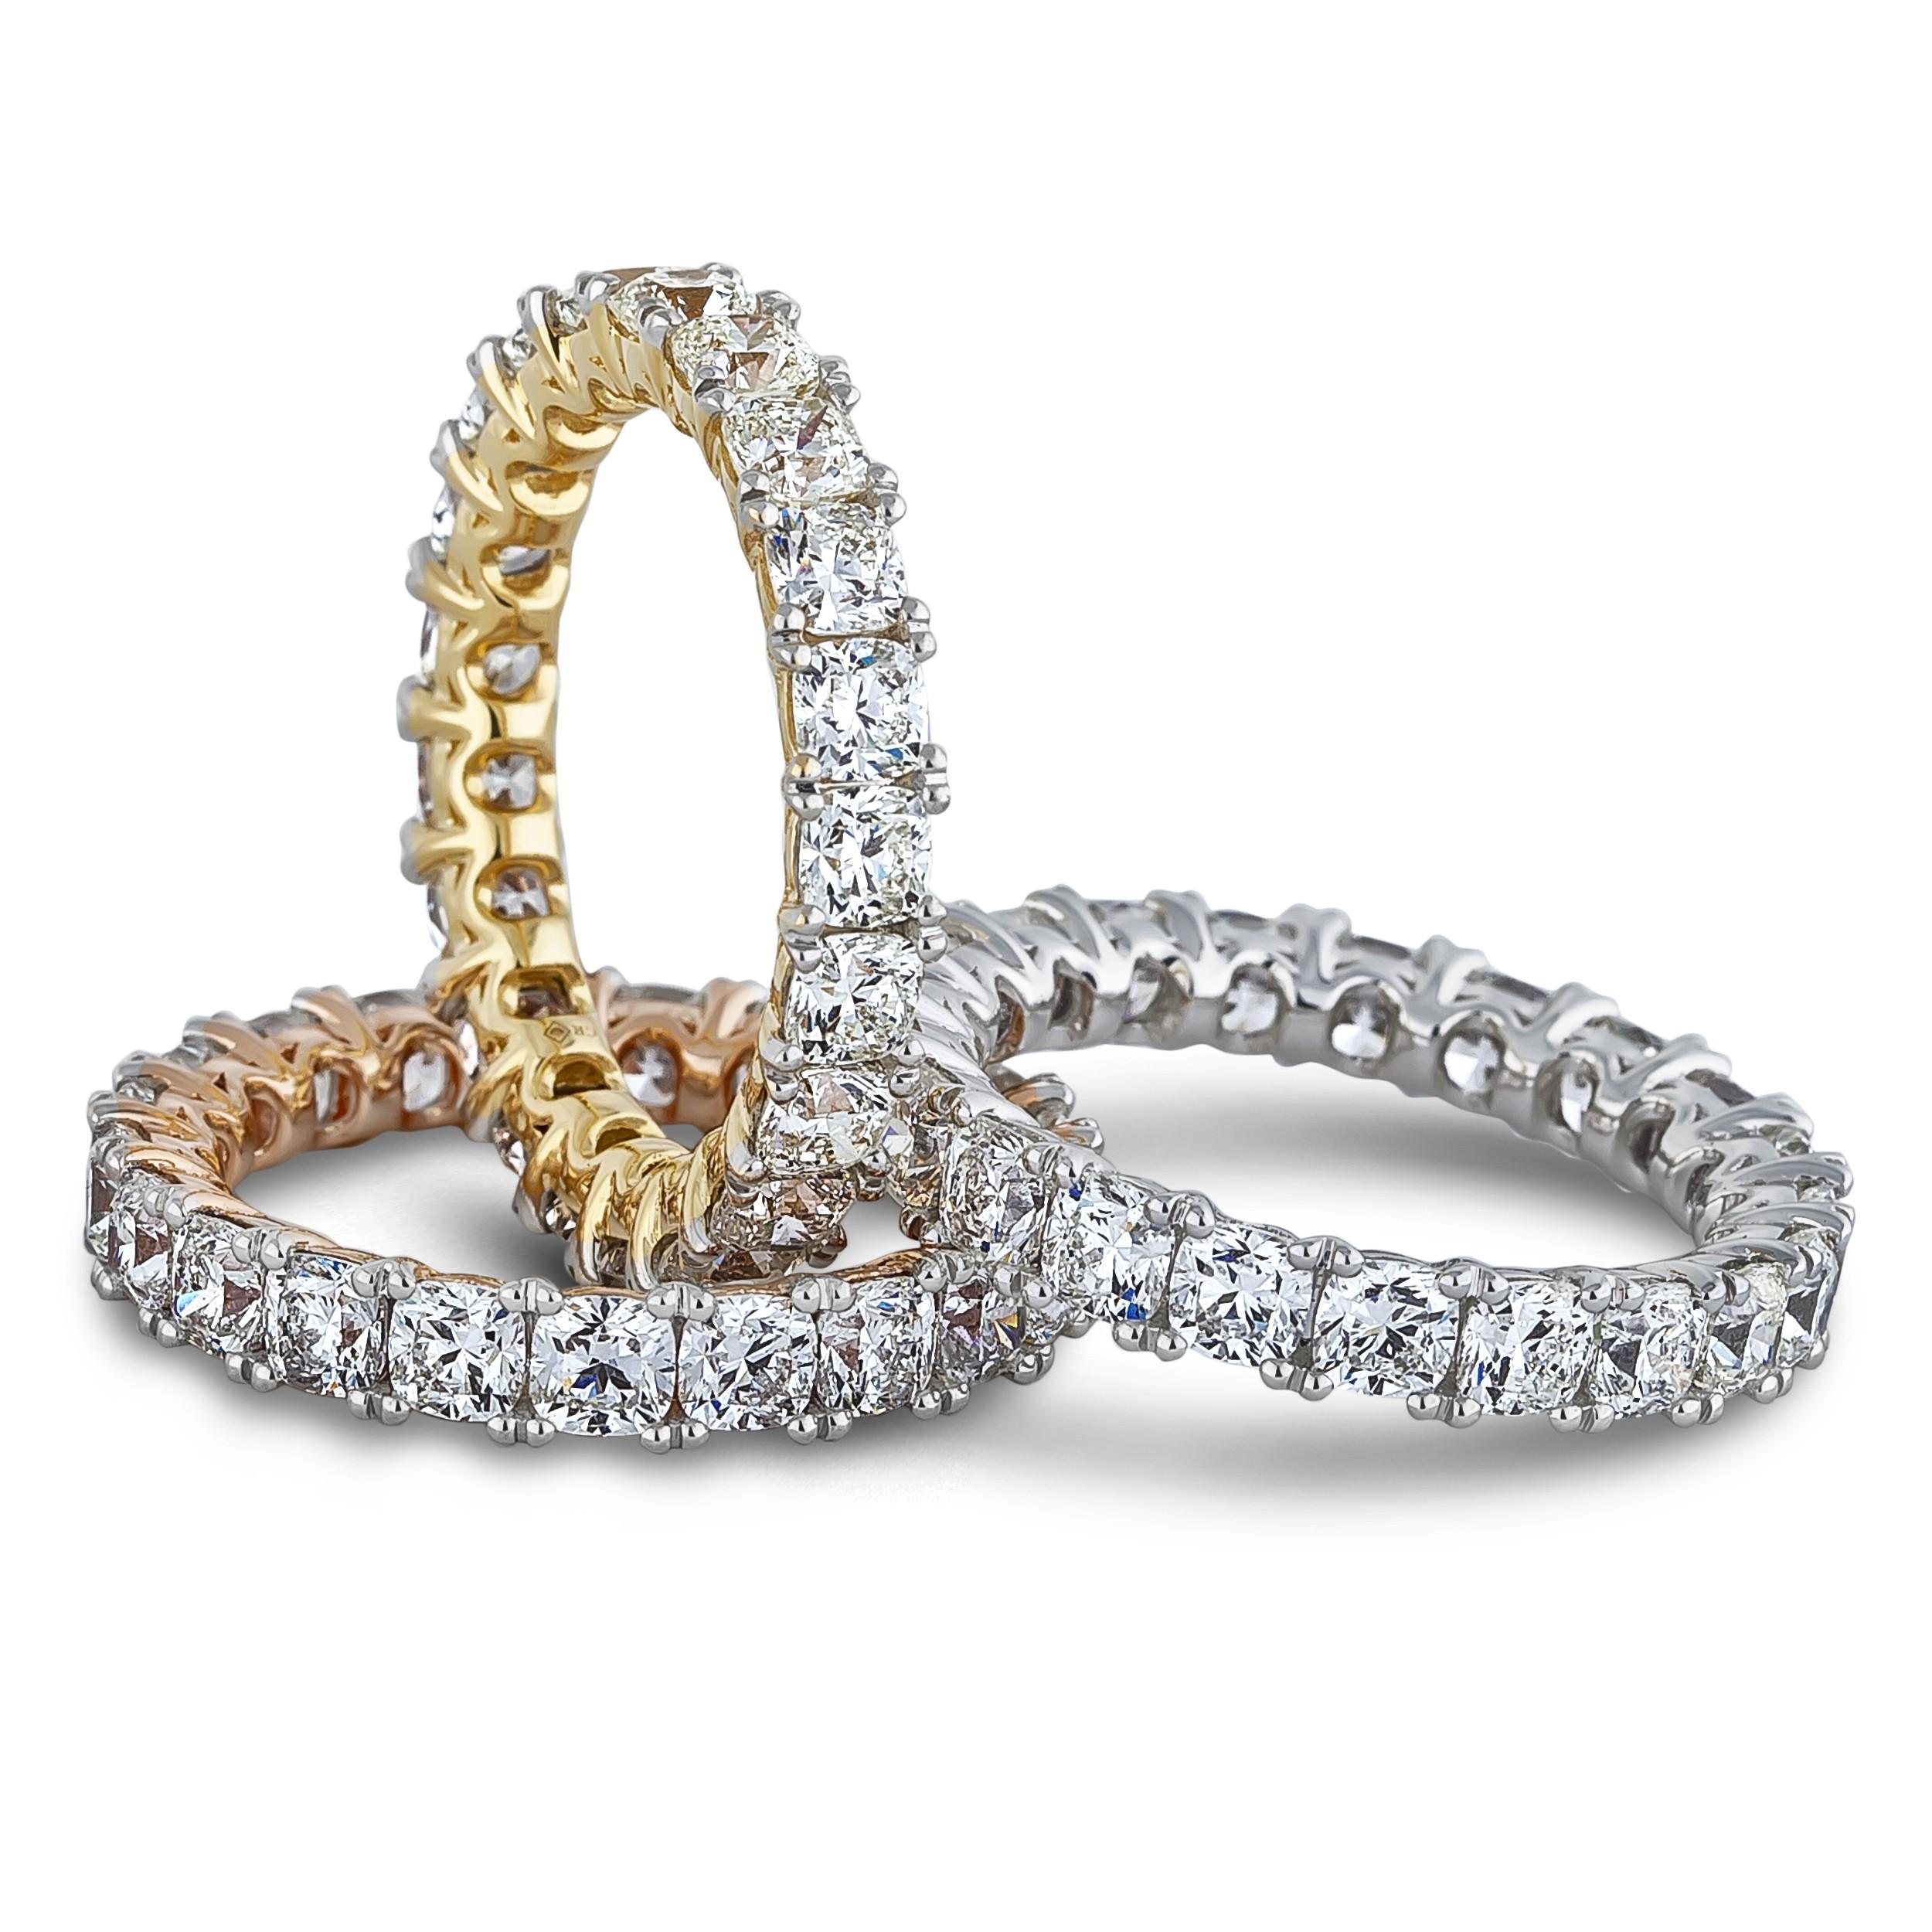 LUGARO IDEAL CUSHION ETERNITY DIAMOND BAND - SGR1156 - Lugaro - Vancouver & Victoria